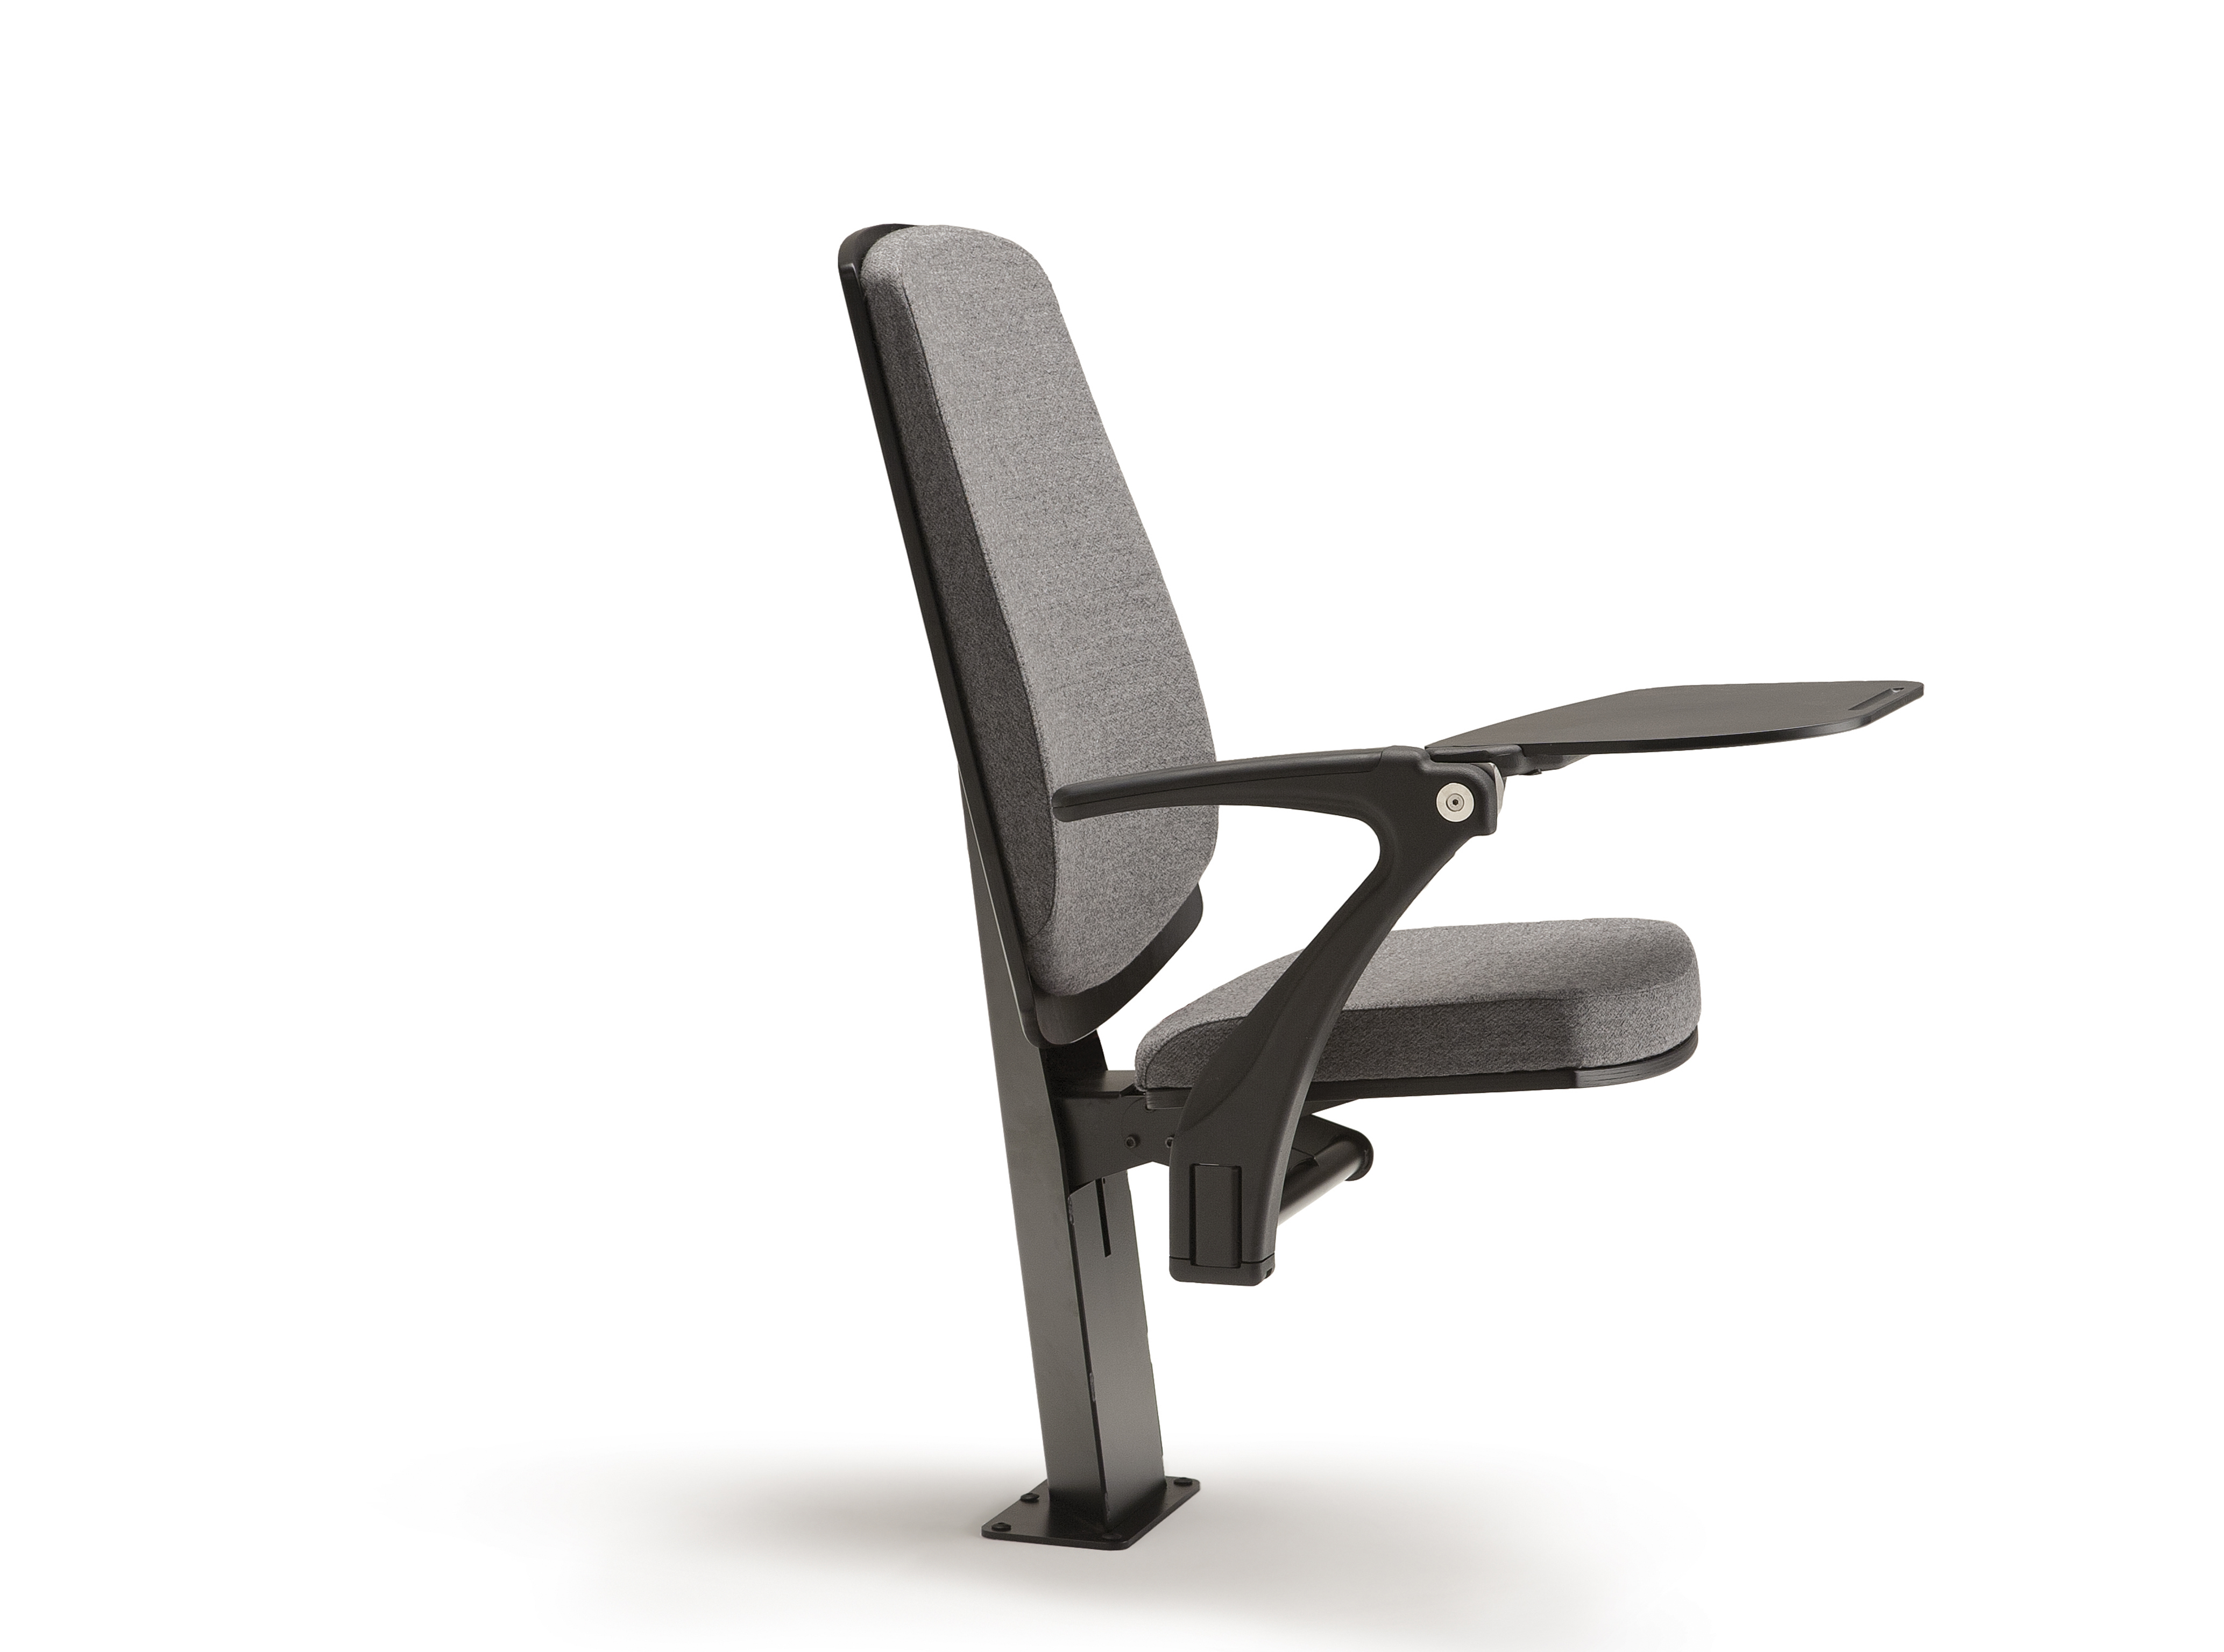 Pro Seat auditoriestol med nedfellbarskriveplate II Fora Form